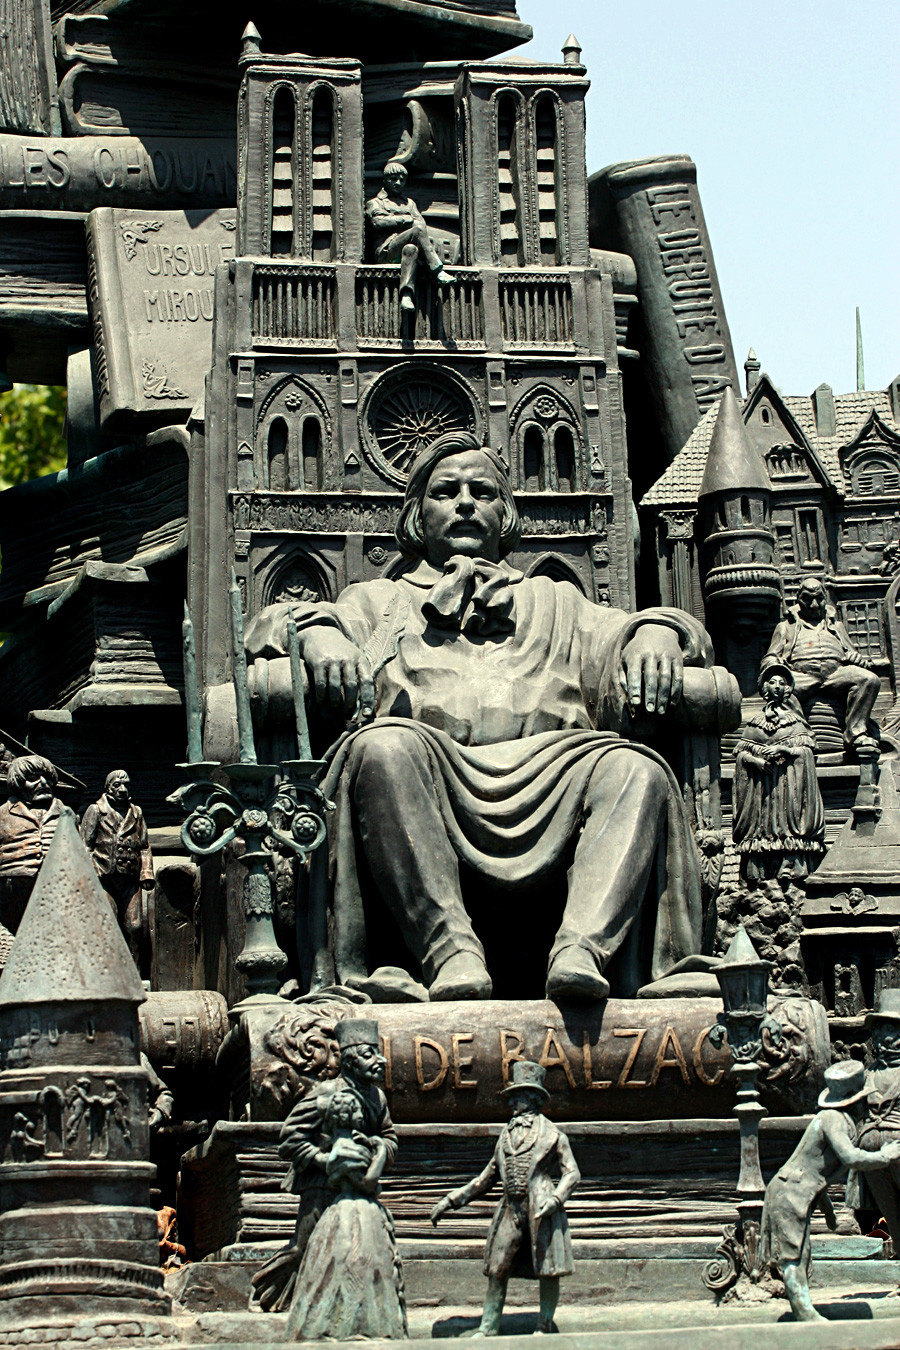 Monumento dedicado a Honore de Balzac en Francia.